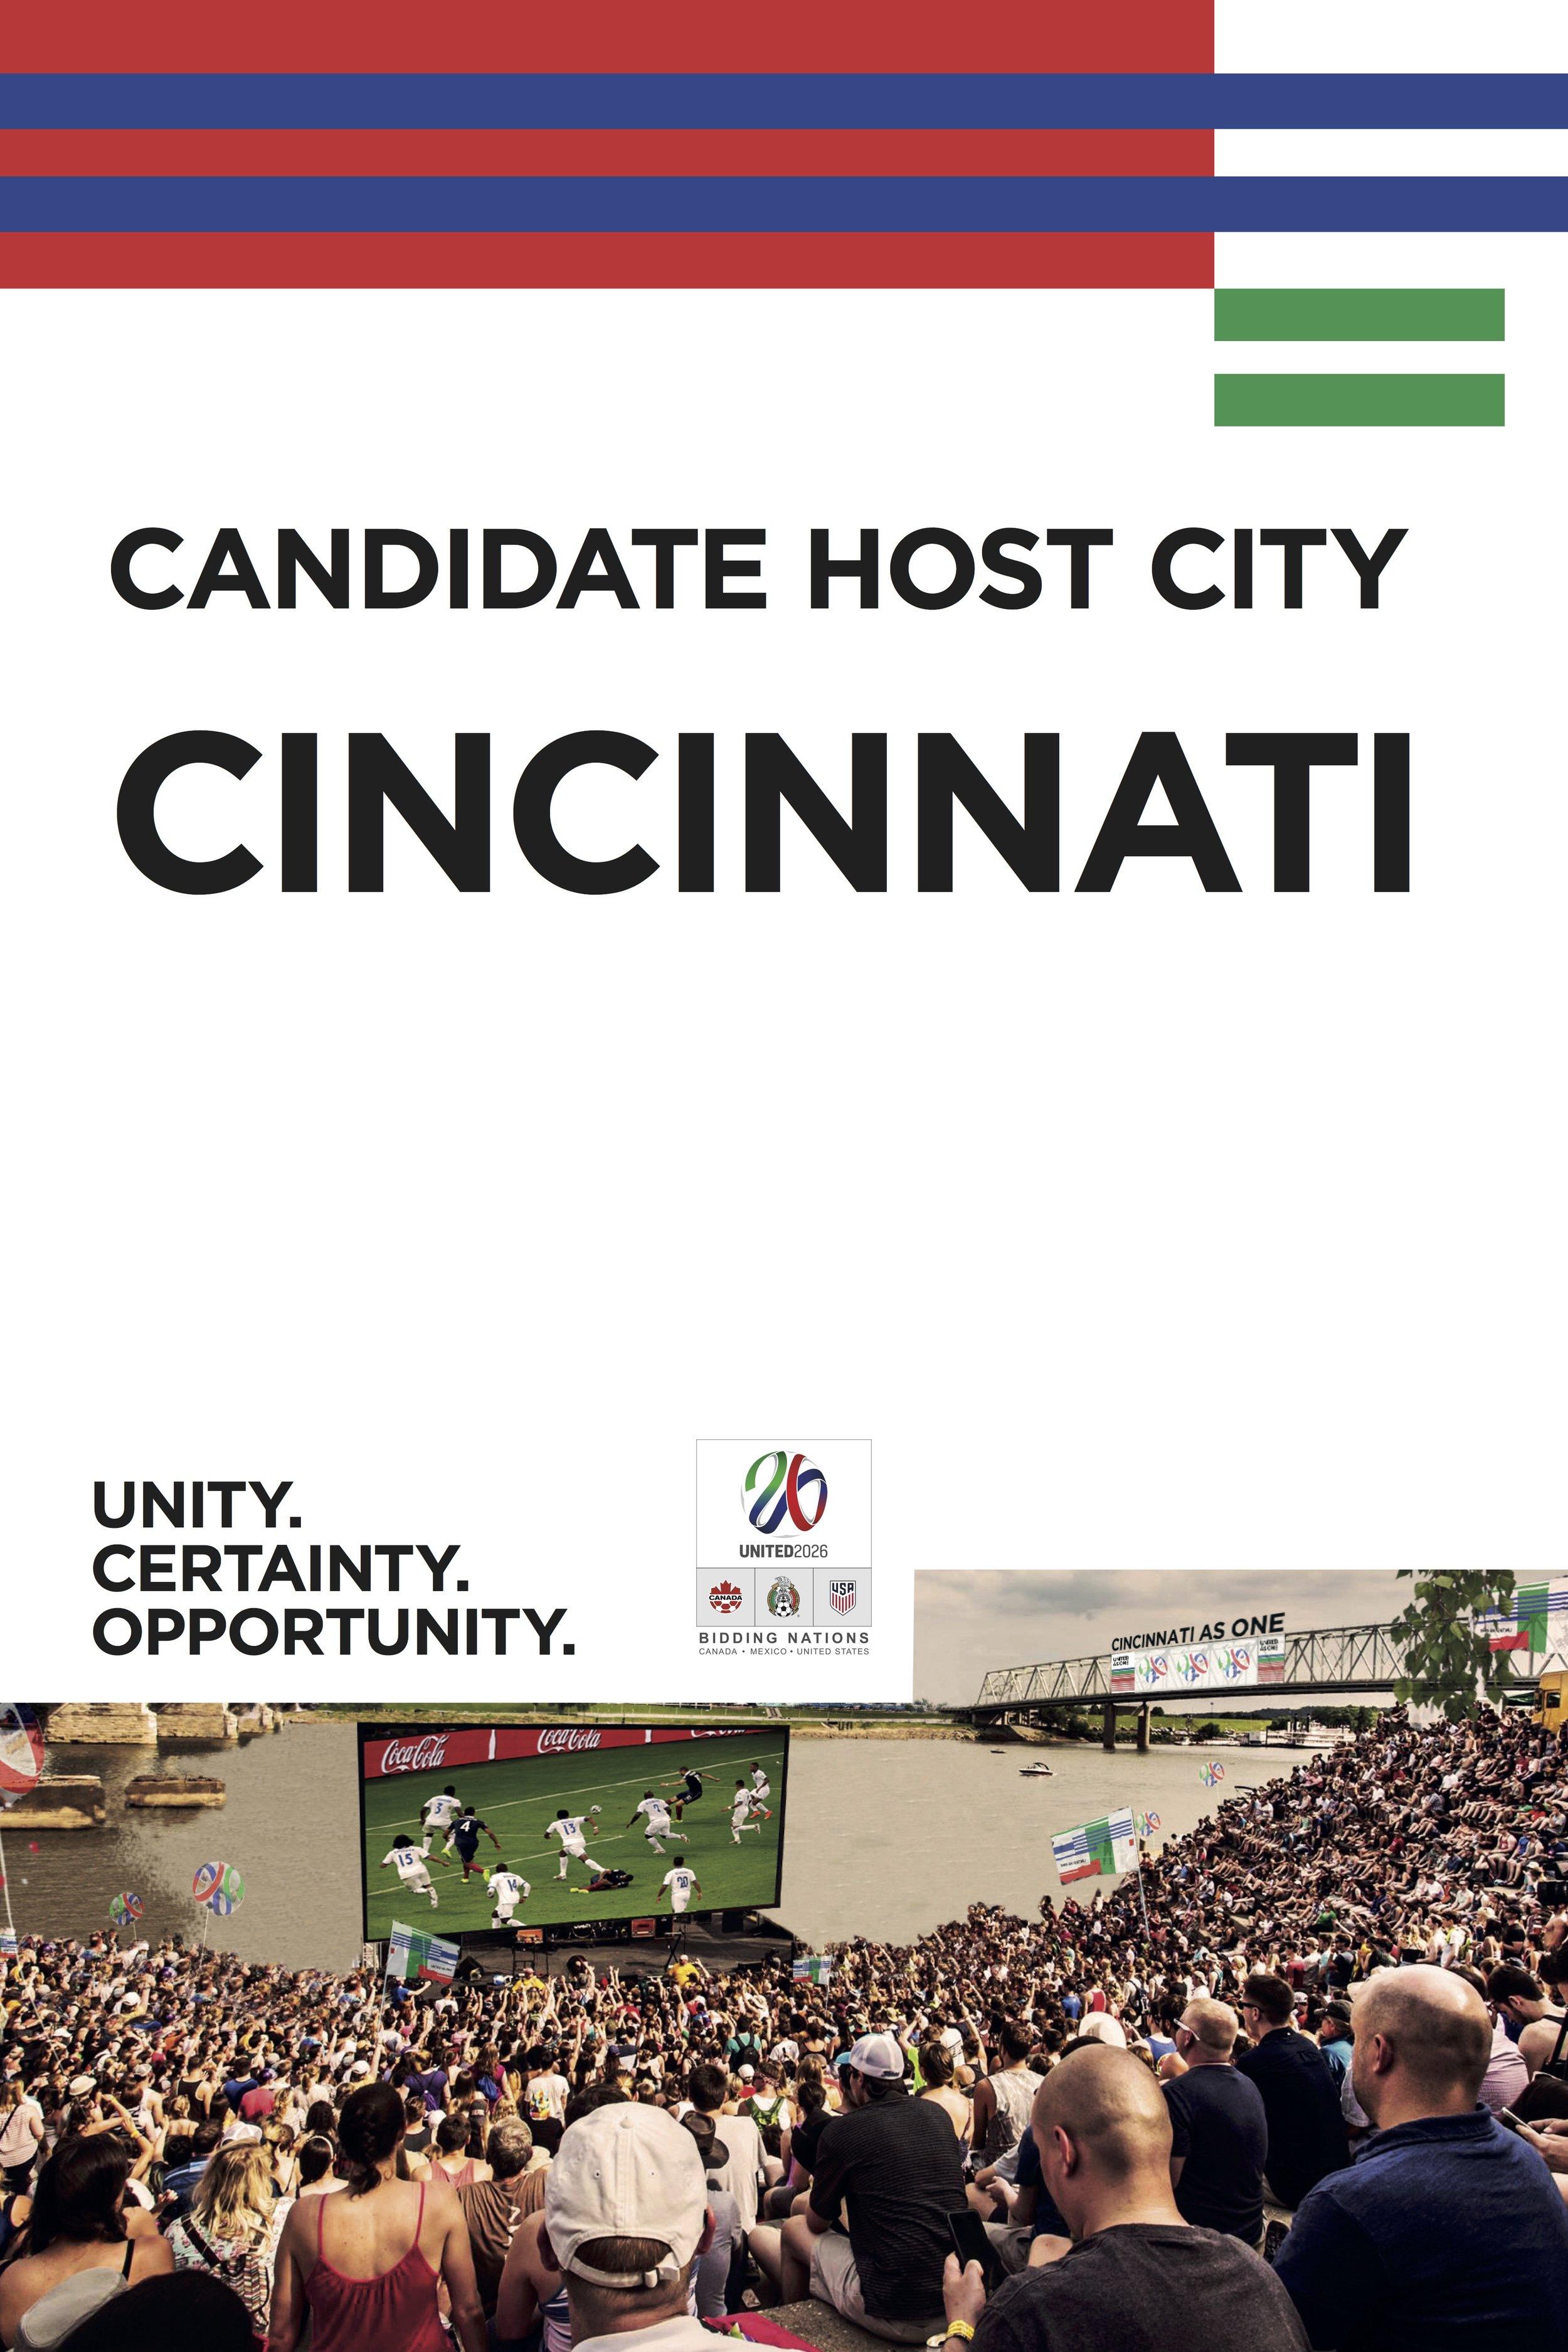 73798_UBC_CHC_Posters_FanFest_Cincinnati_1 (1).jpg